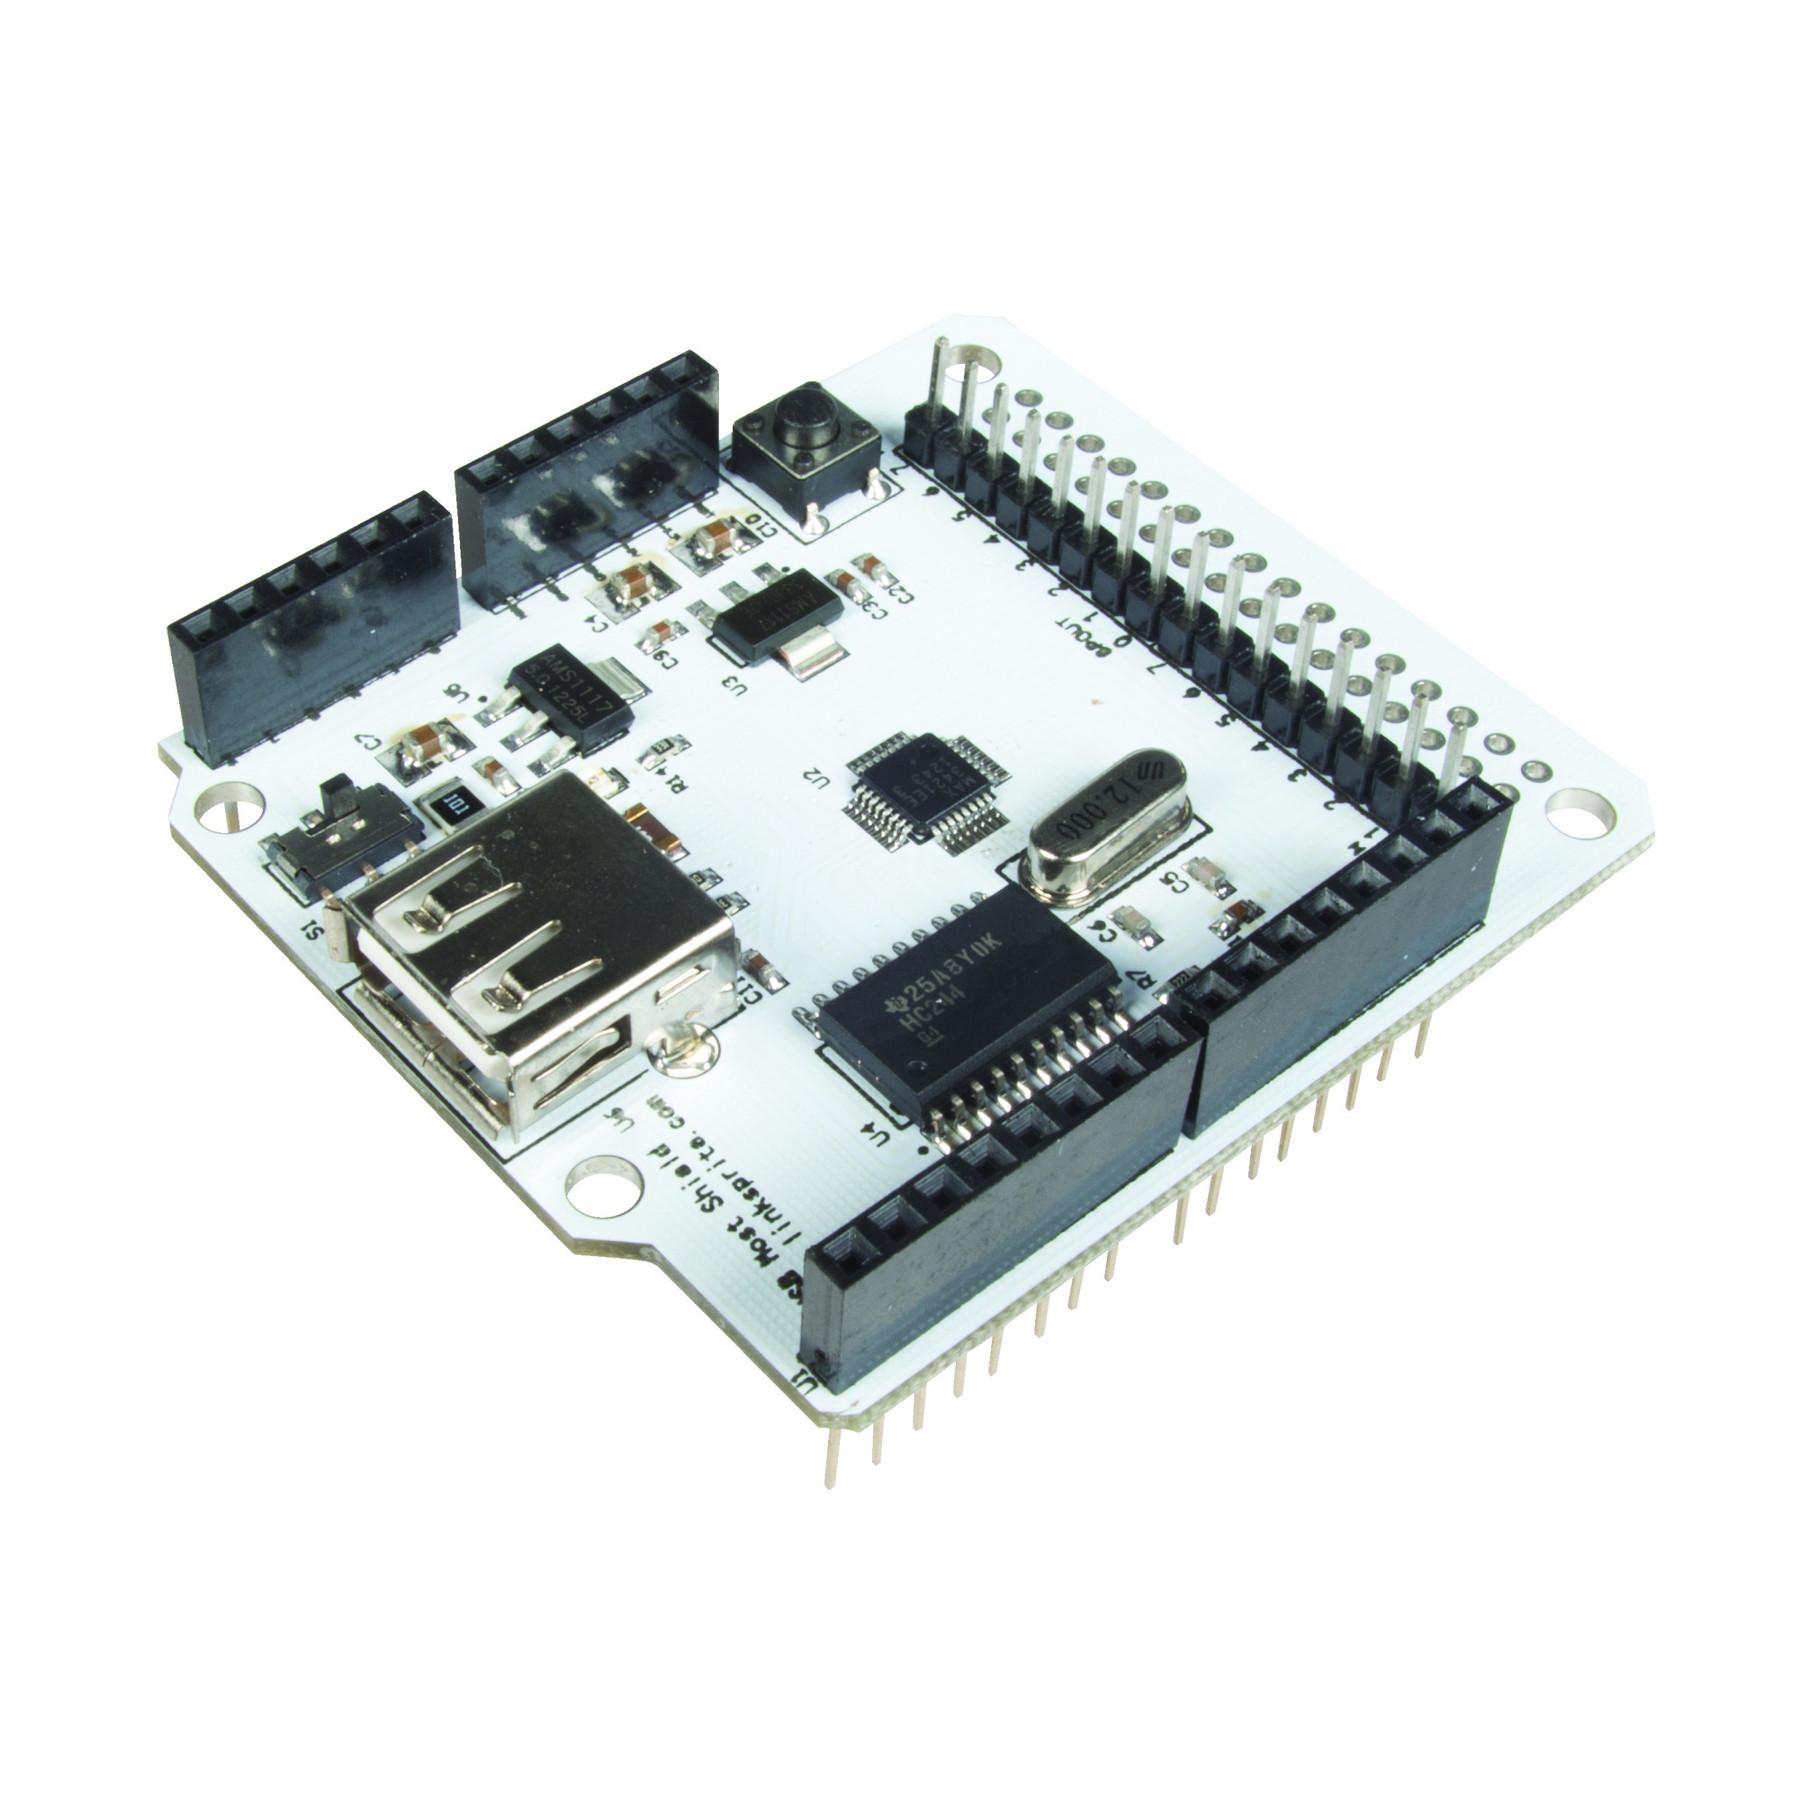 Usb host shield for arduino new ebay